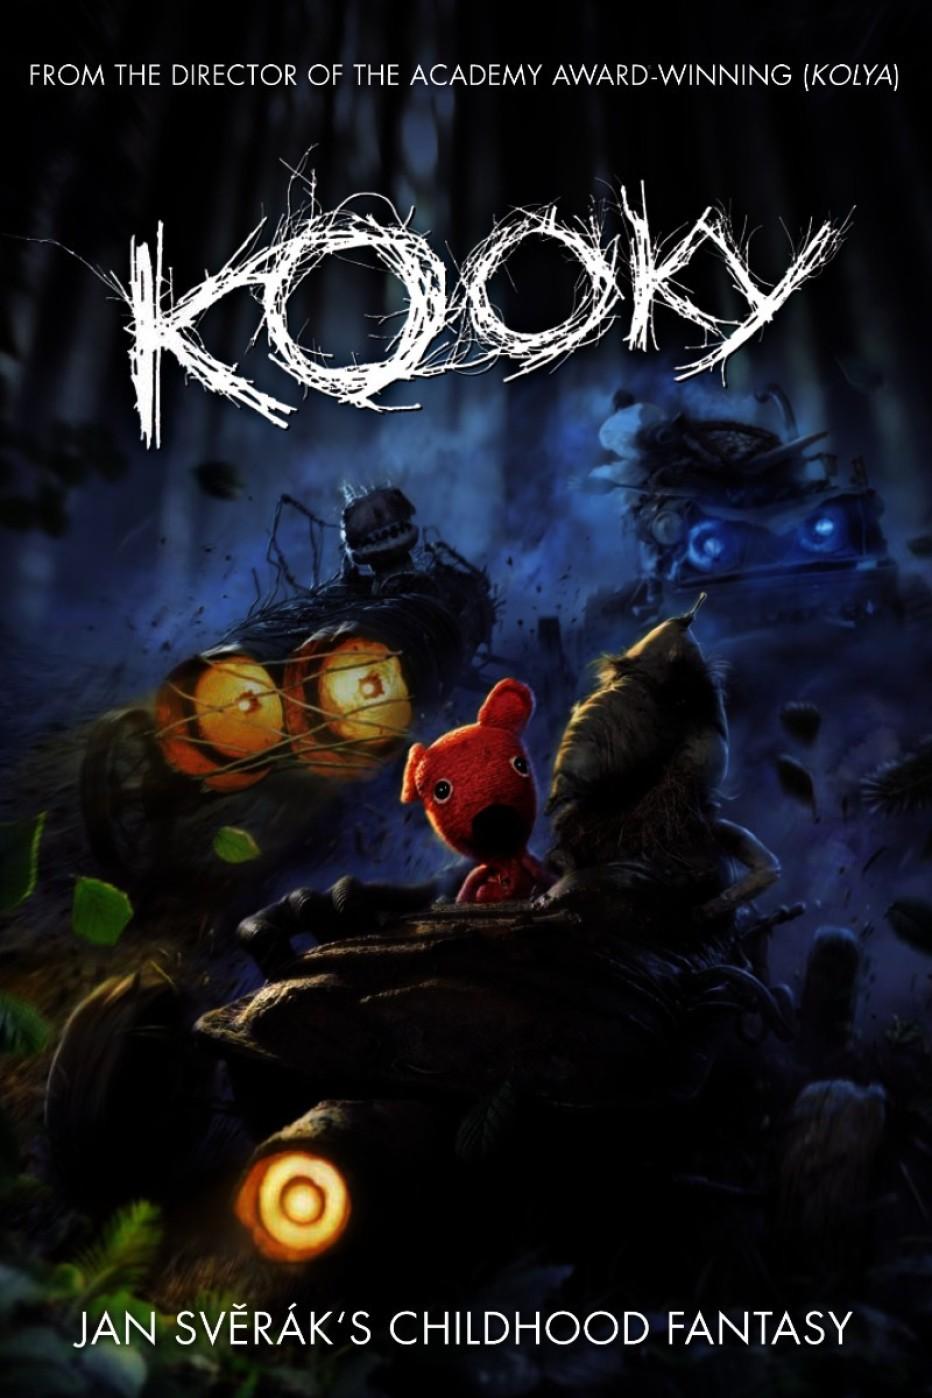 kooky-2010-jan-sverak-15.jpg